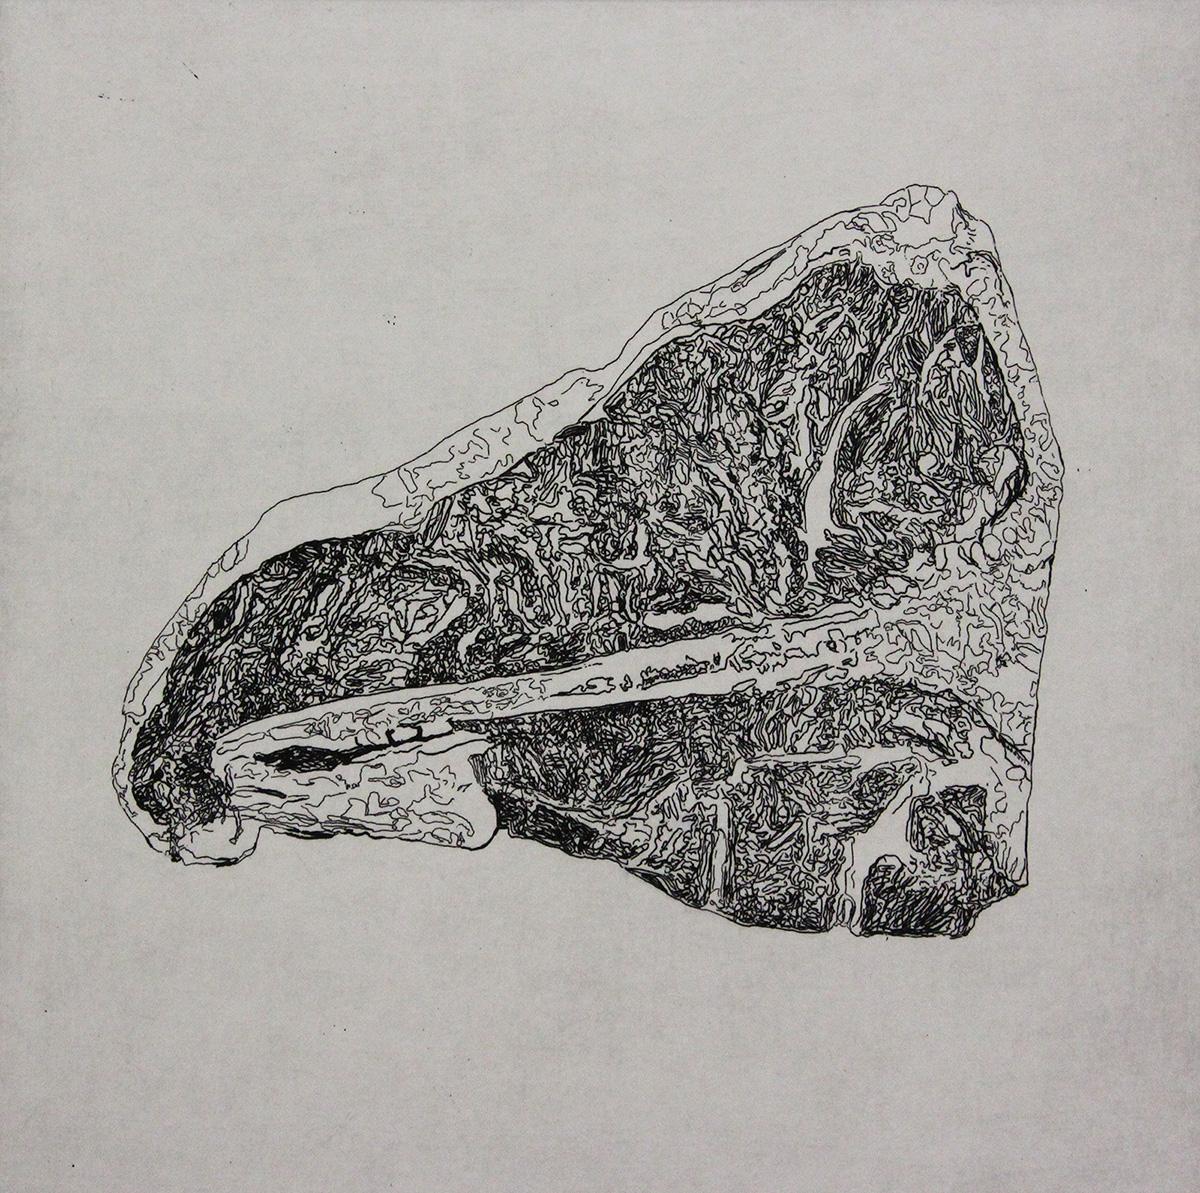 CP14 Intaglio Print by Evan Summer